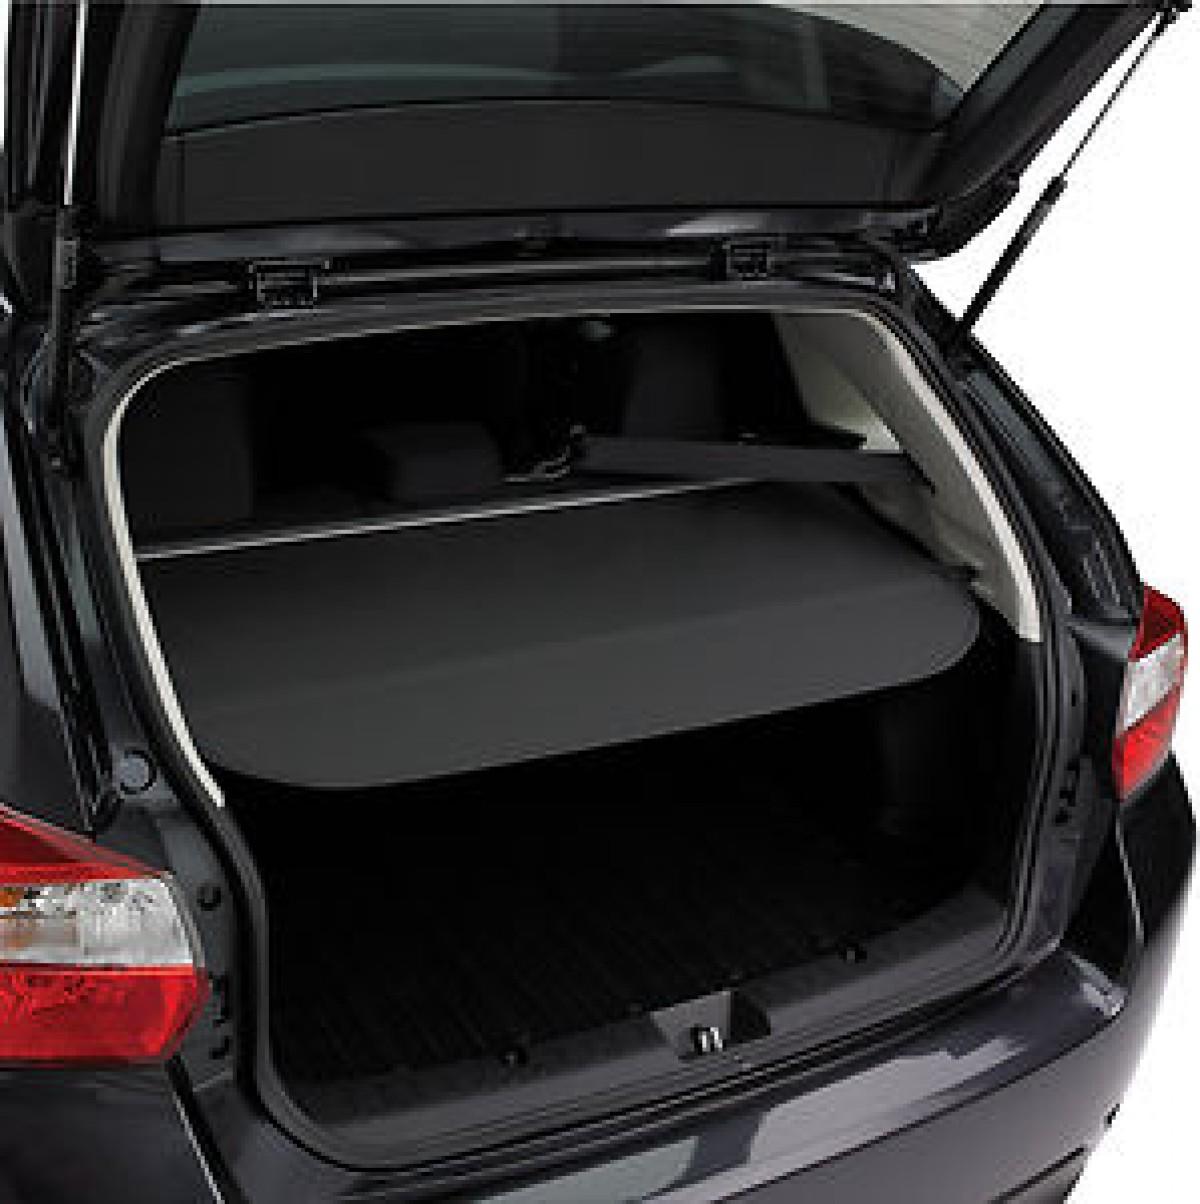 Subaru Tonneau Cover Part No 65550fj001vh